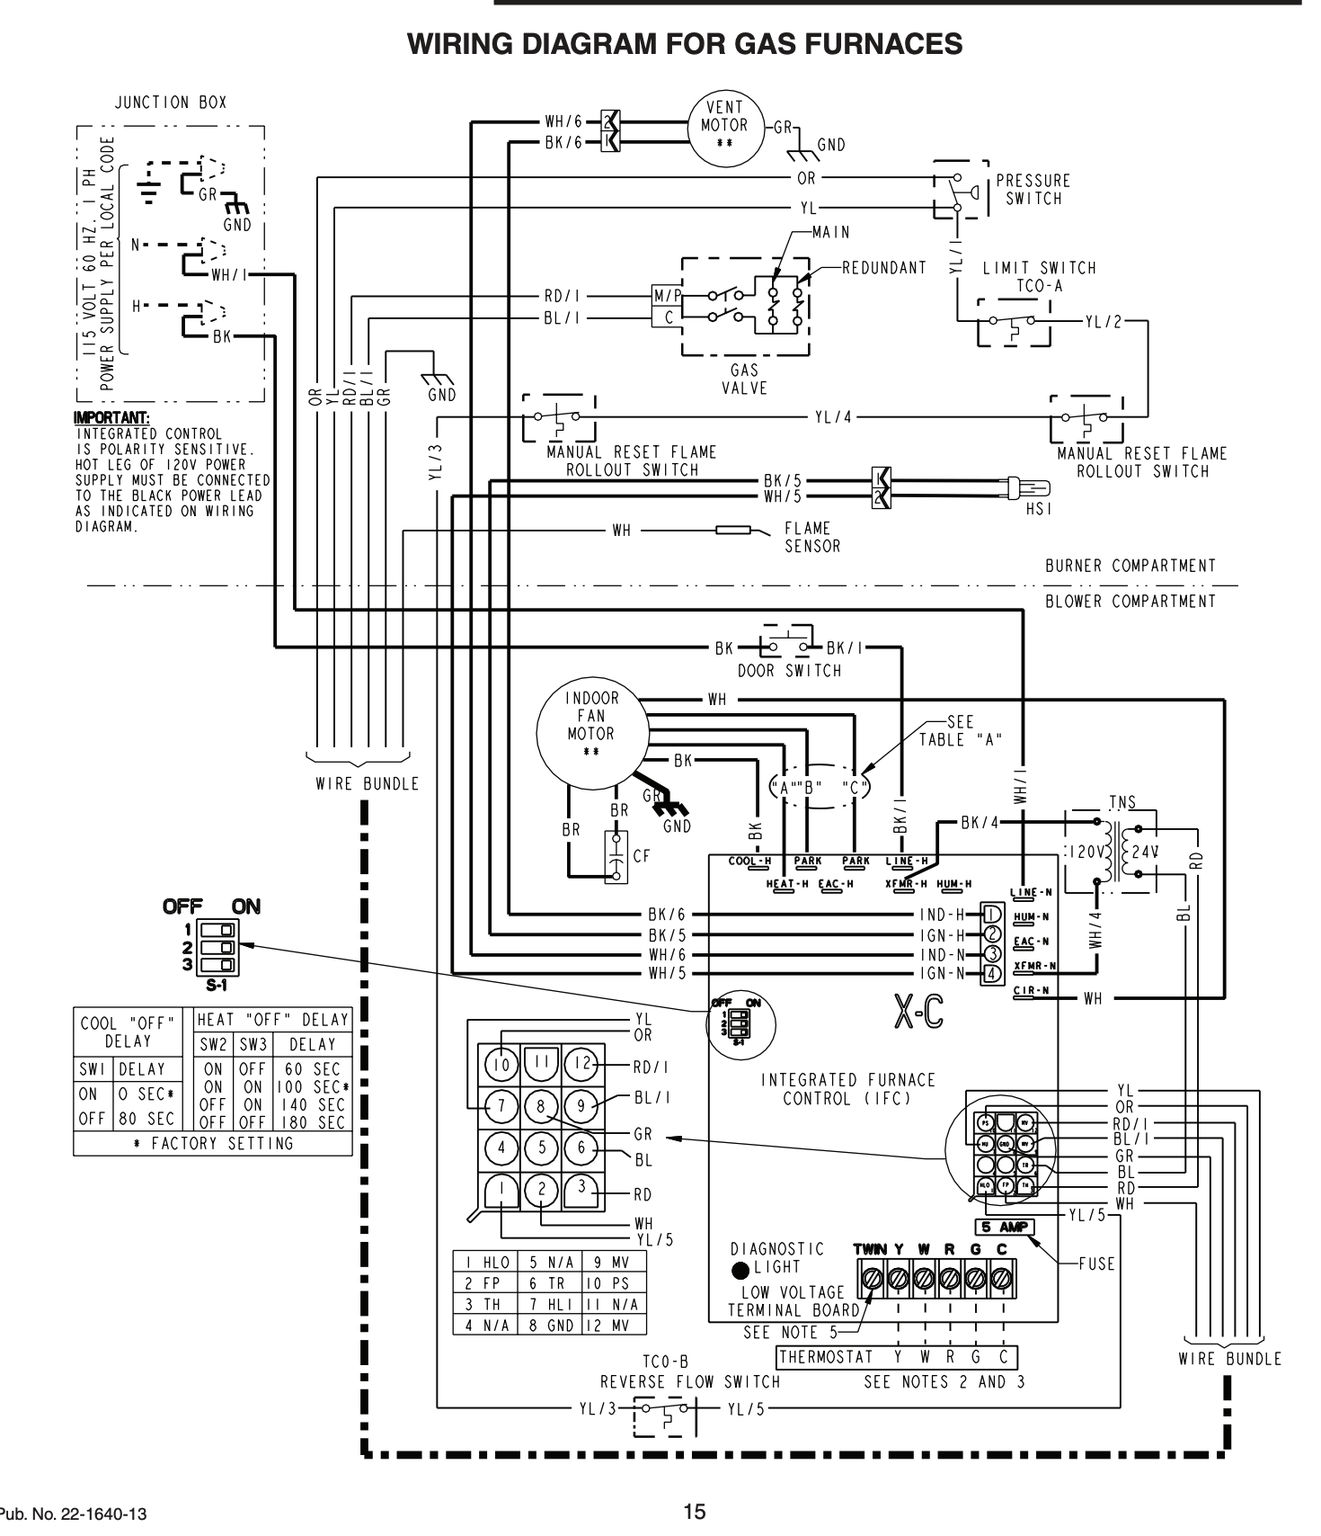 forced air wiring diagram